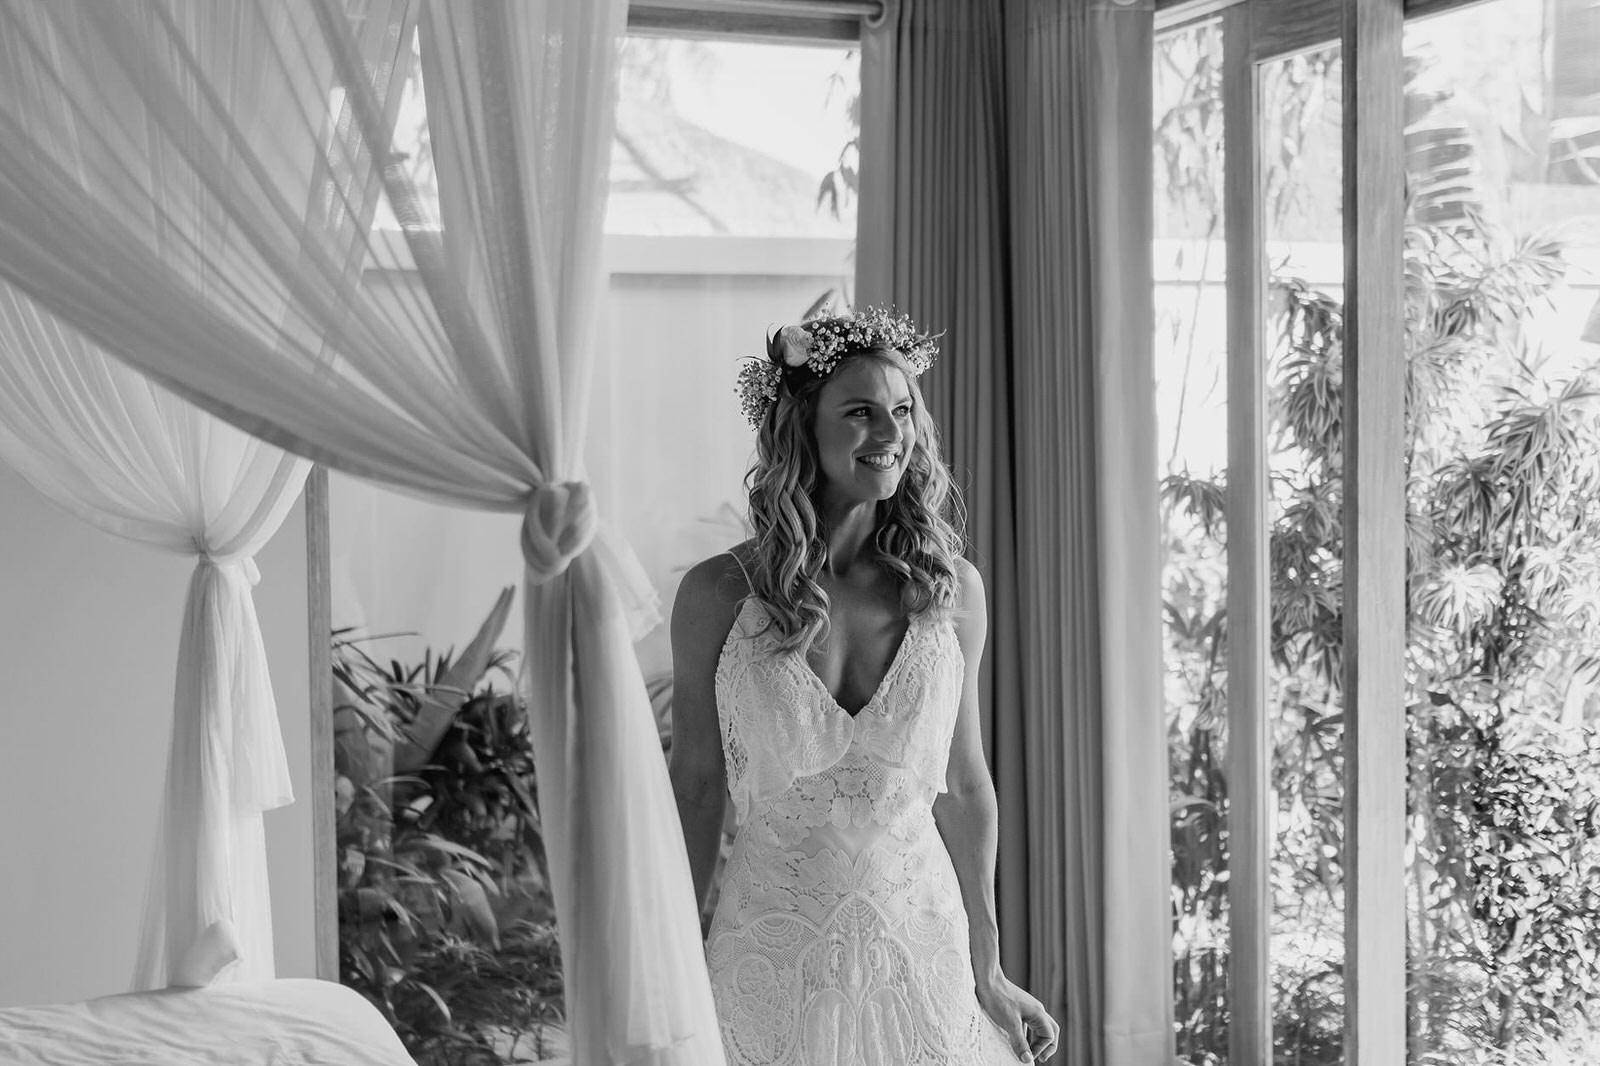 newfound-hai-tide-nusa-lembongan-bali-wedding-photographers-079